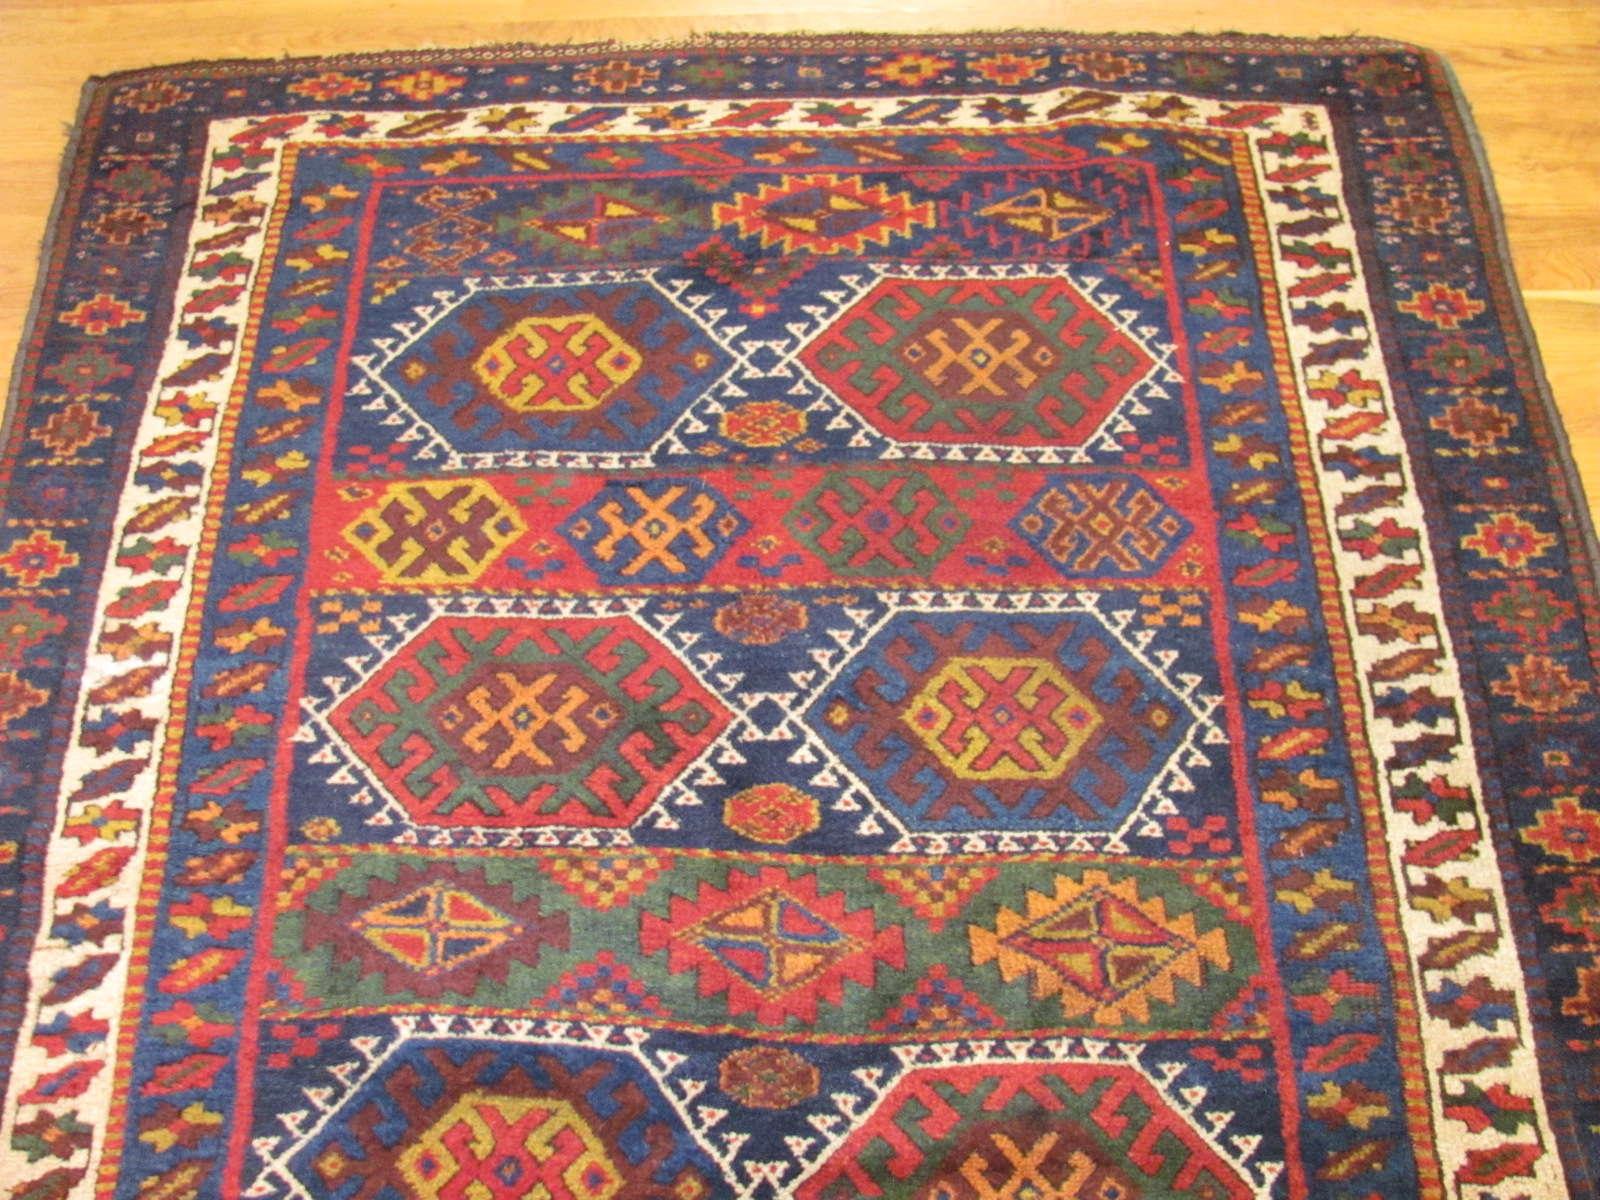 24554 antique persian joffee kurd rug 4,9x7,9 -1